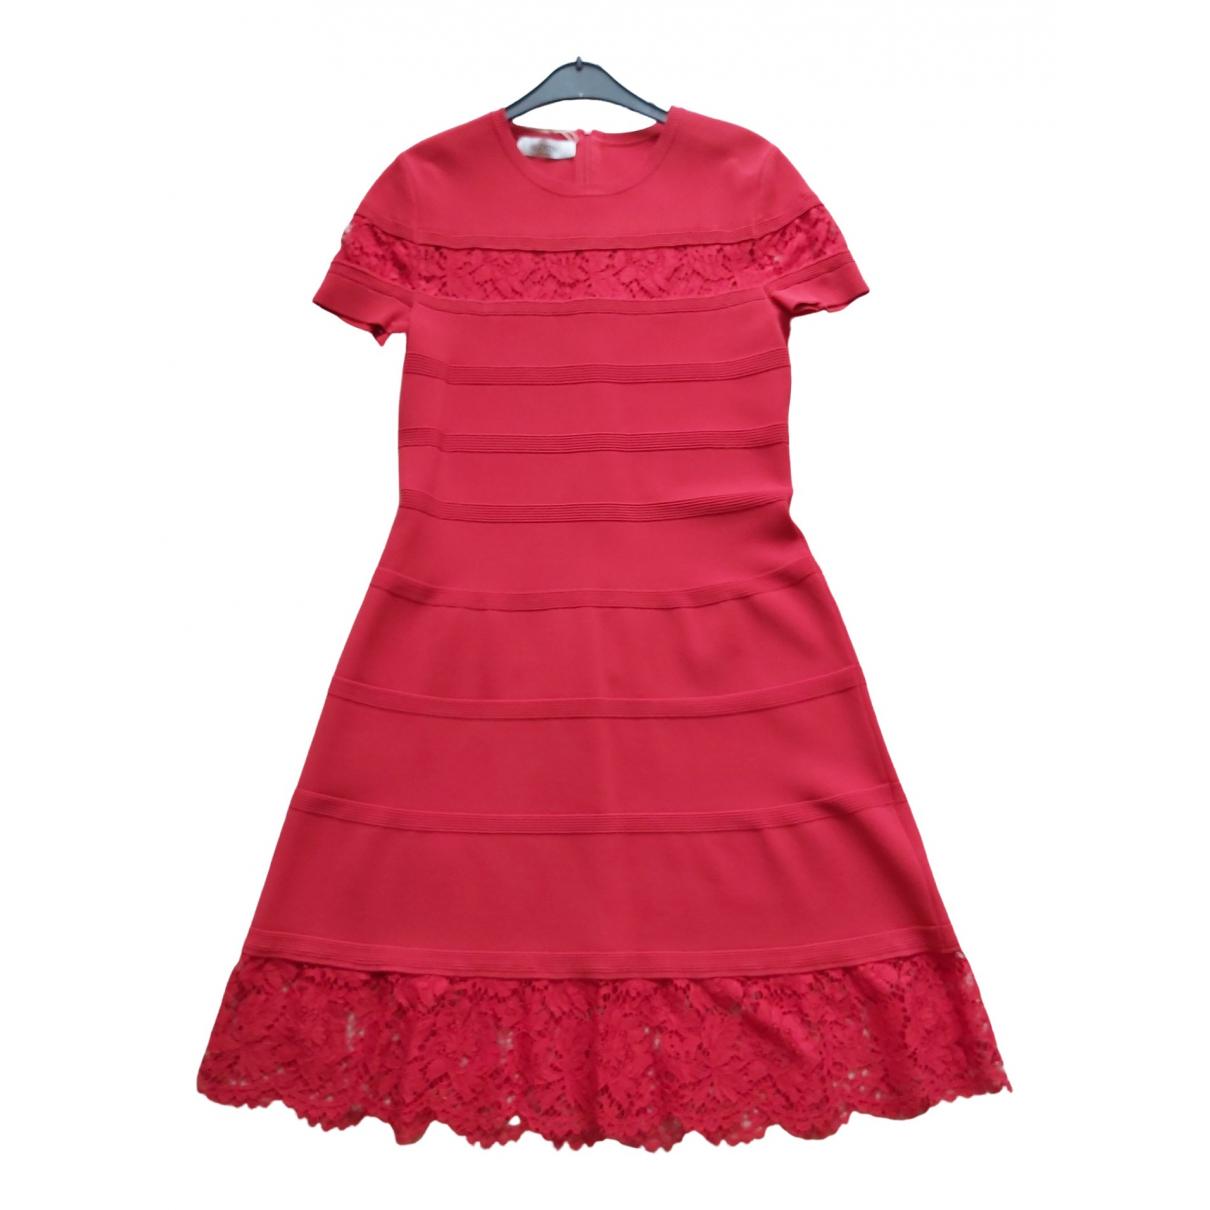 Valentino Garavani \N Red dress for Women One Size FR